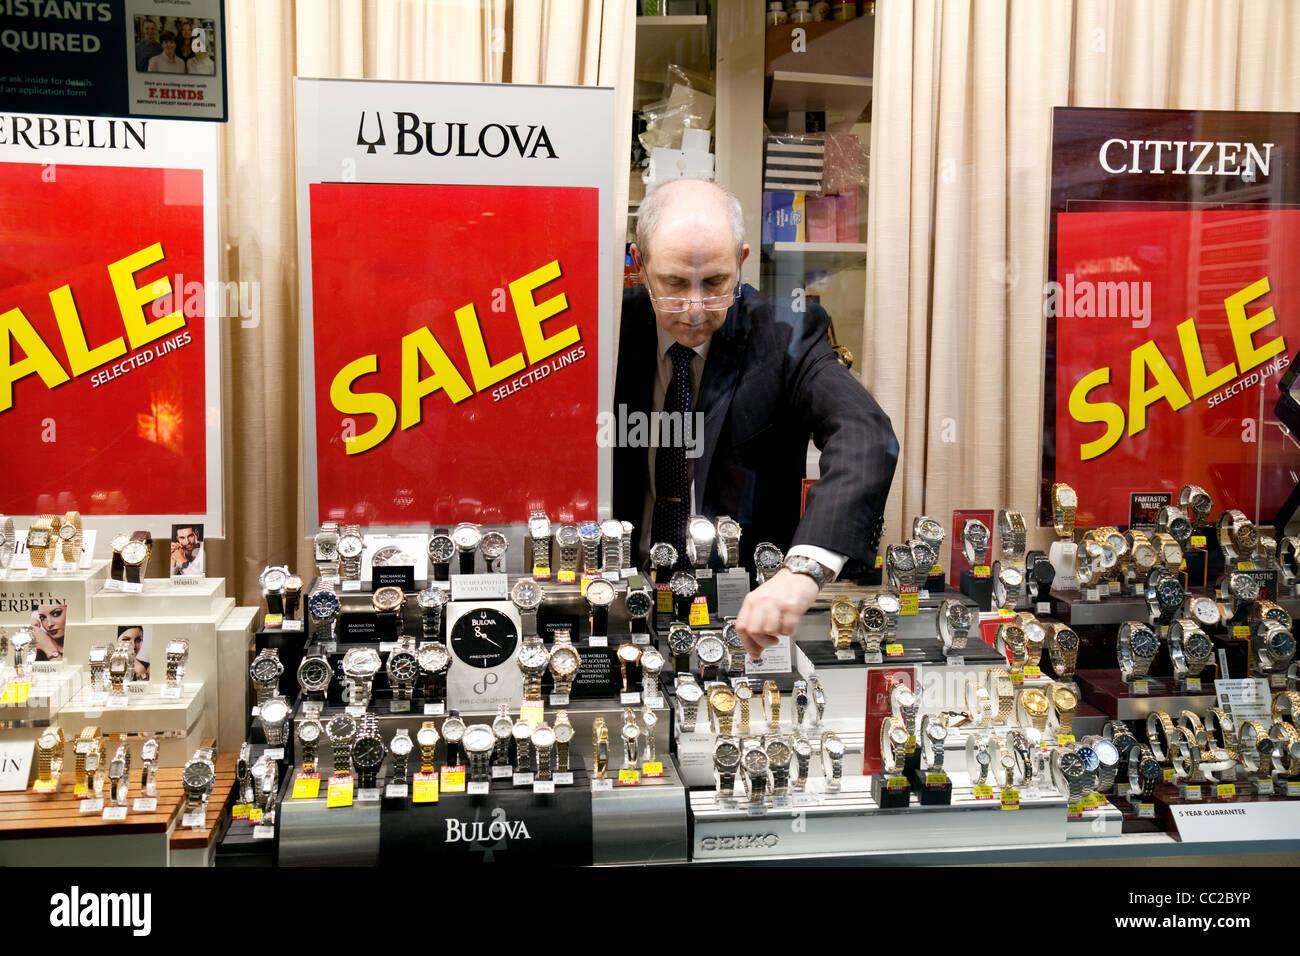 A jeweller adjusting his shop window in a sale, Cambridge UK - Stock Image